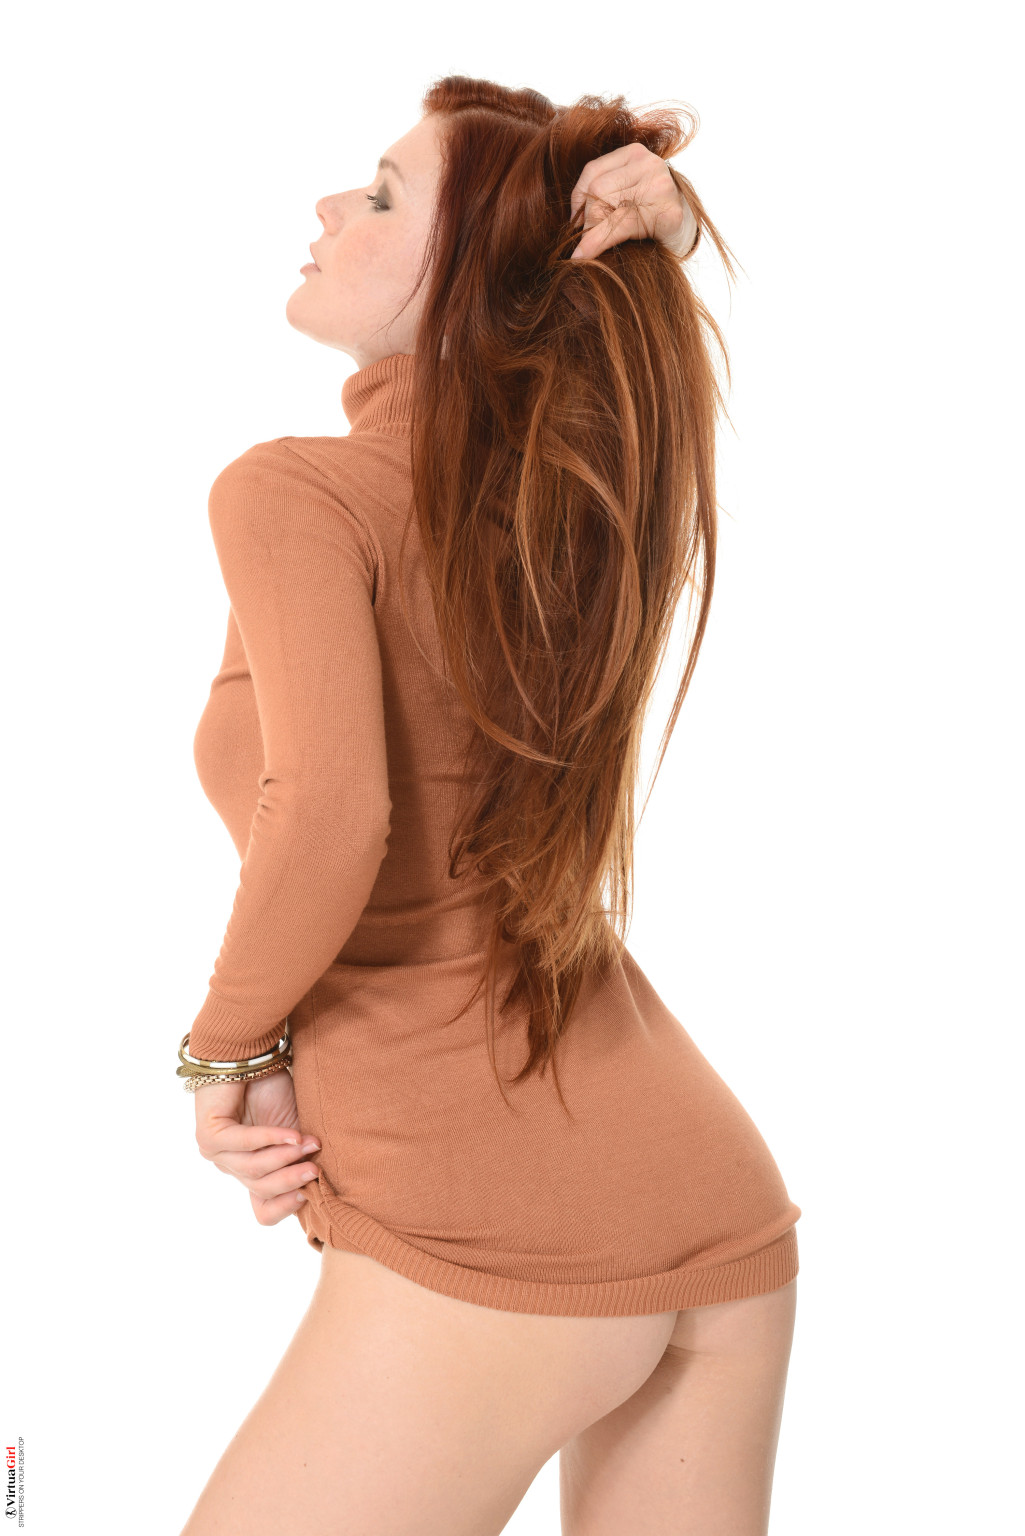 Mia Sollis - Фигуристые женщины - Галерея № 3490850